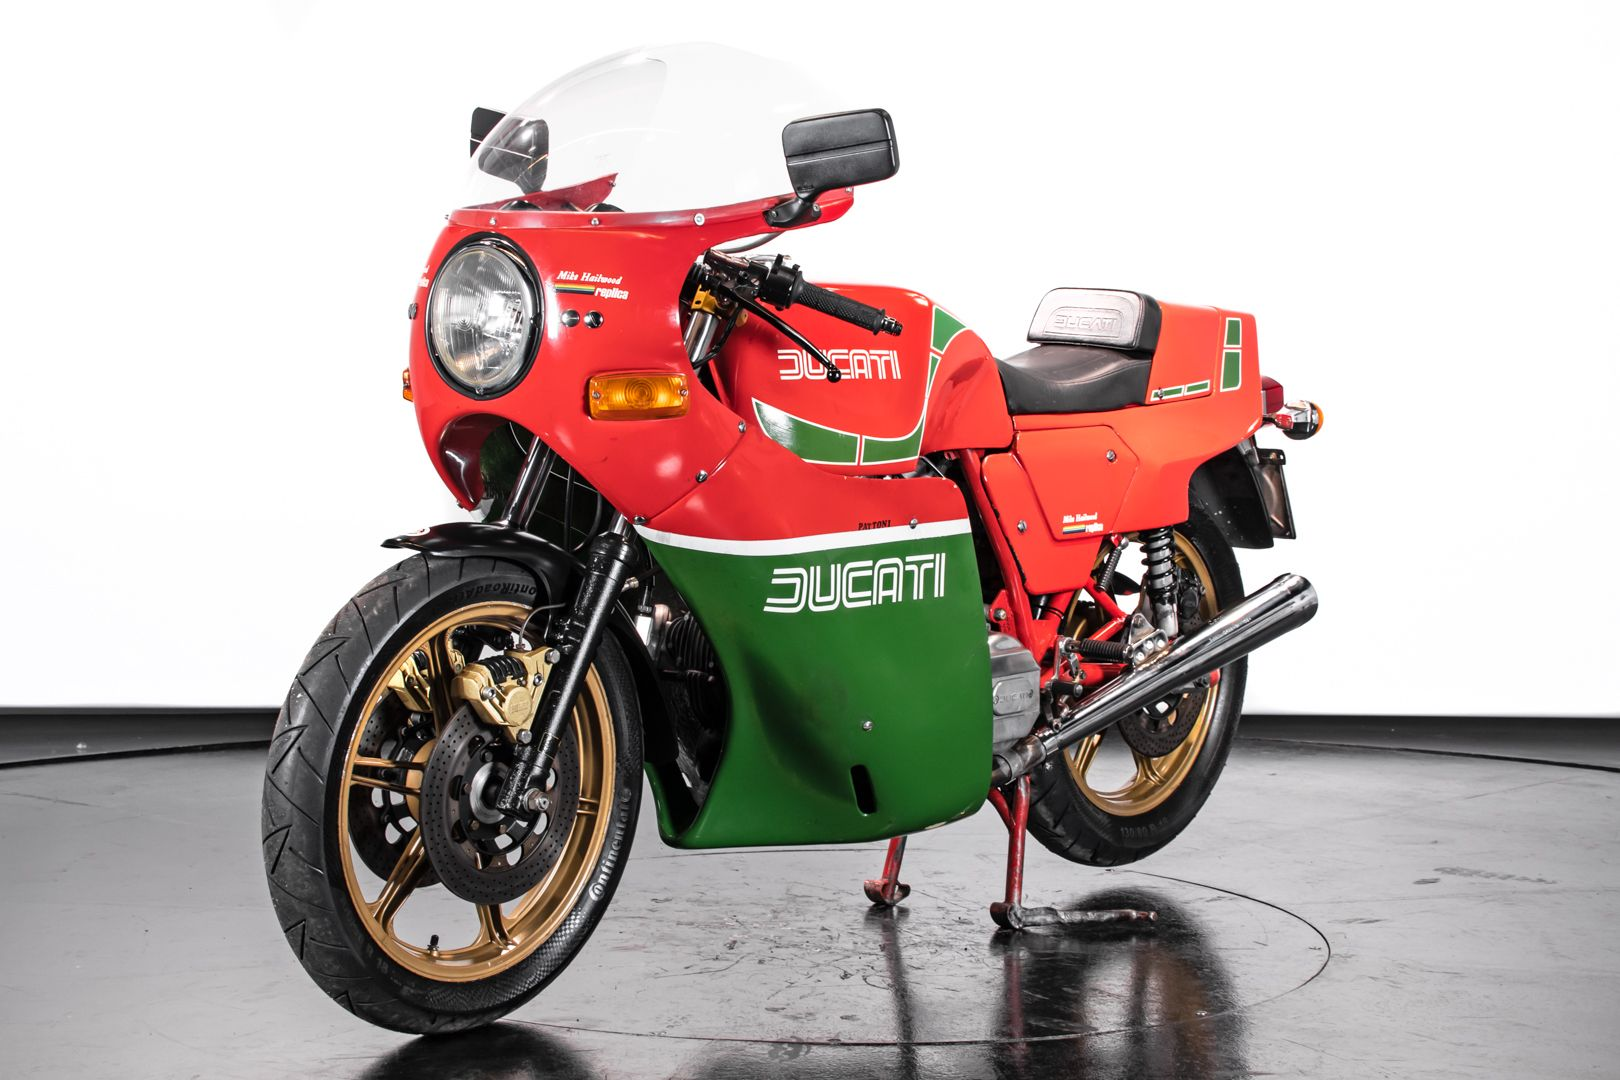 1983 Ducati 900 Mike Hailwood Replica 71411